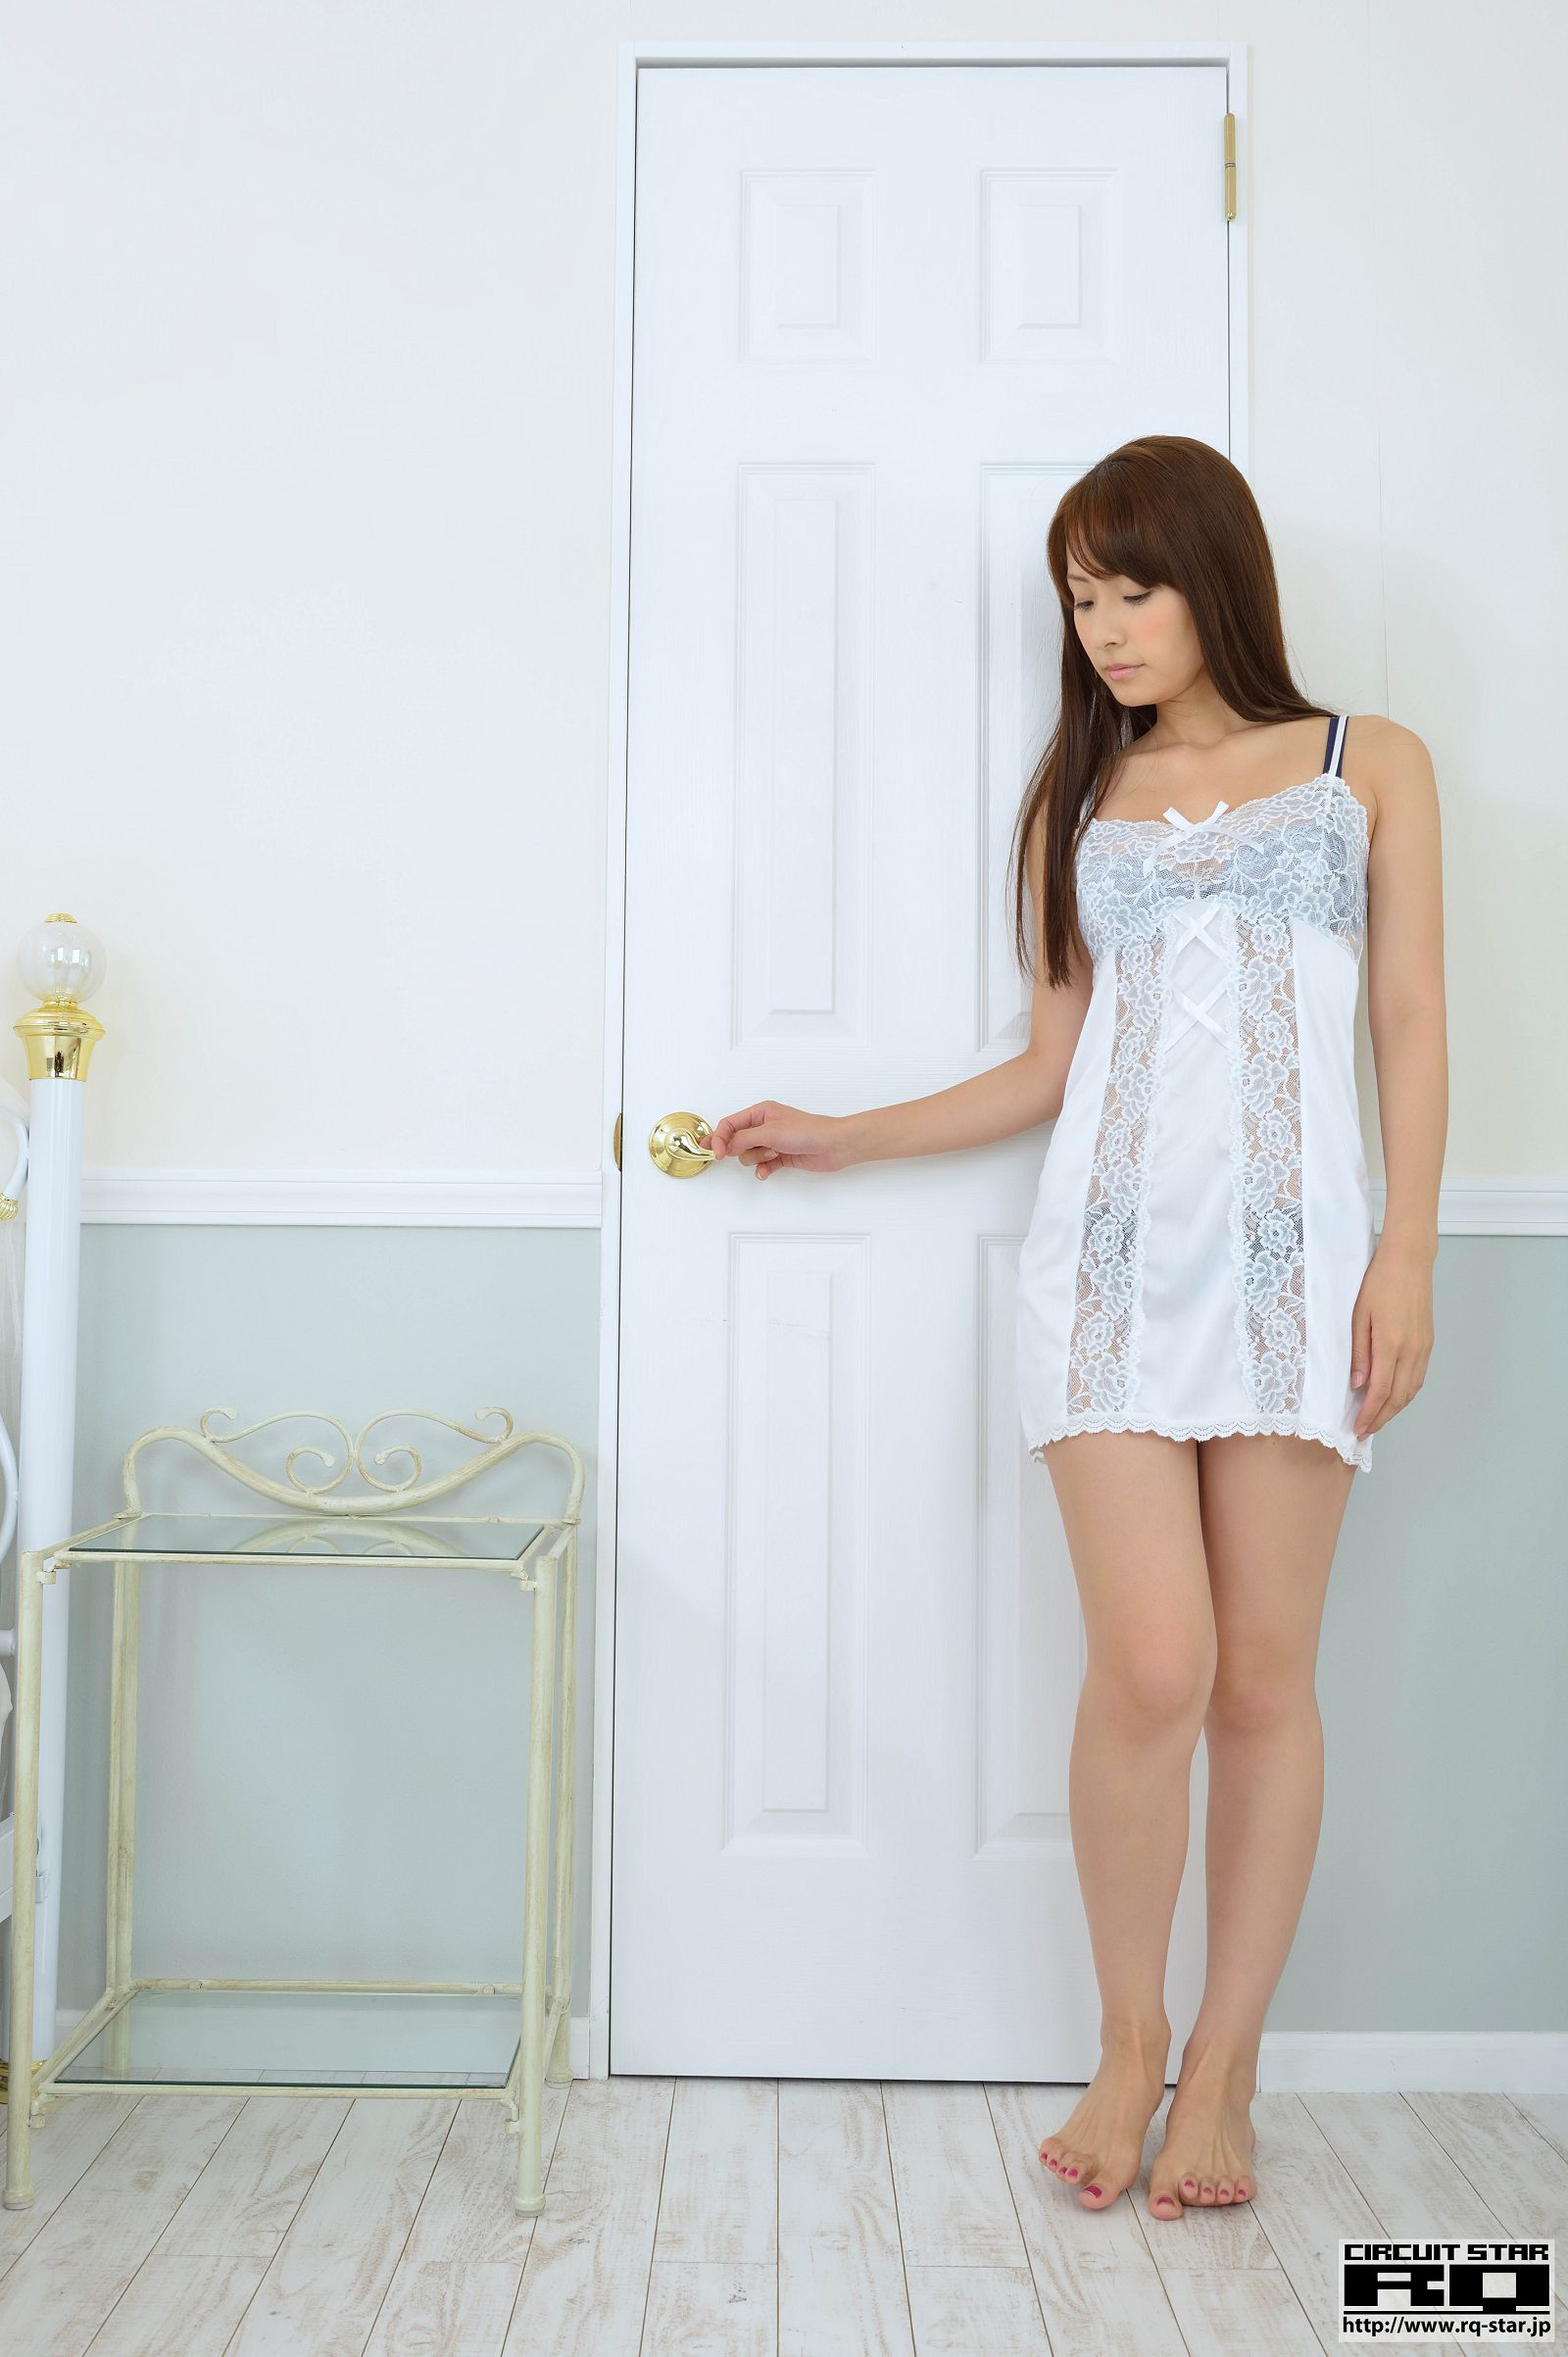 [RQ STAR美女] NO.01173 Rena Sawai 澤井玲菜 Pajamas[100P] RQ STAR 第1张